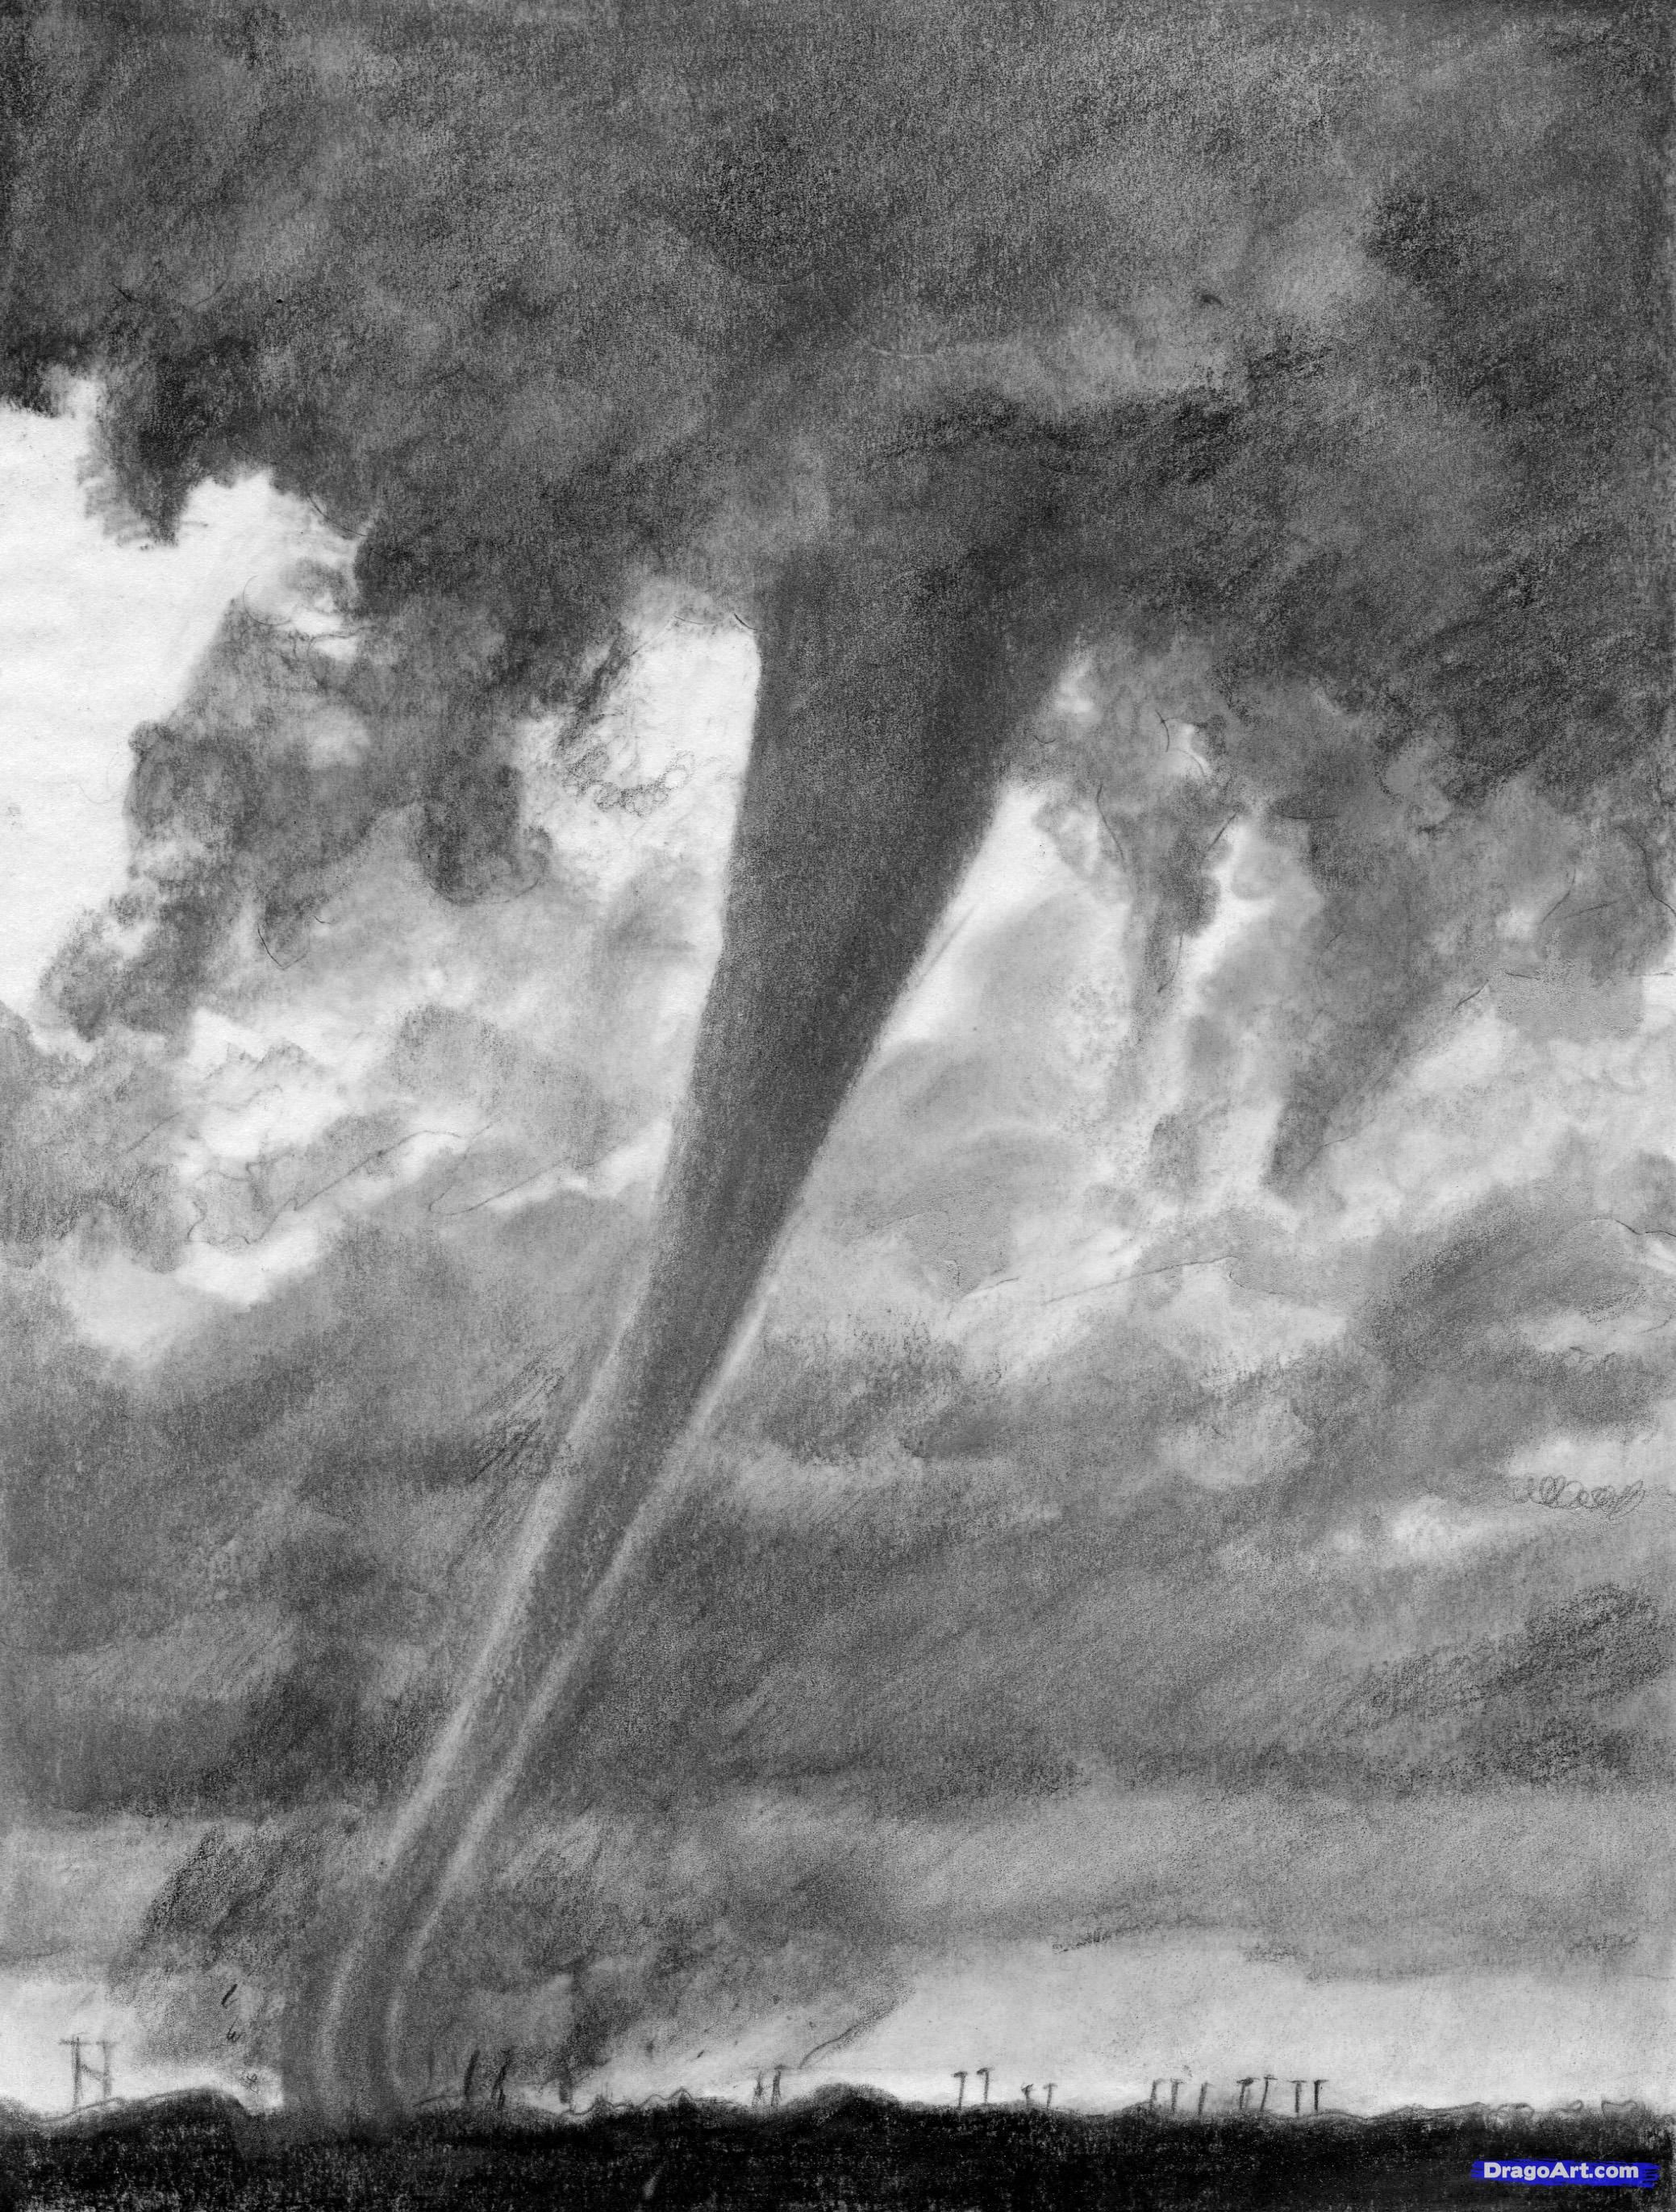 How To Draw A Realistic Tornado, Draw Realistic Tornadoes Step 21